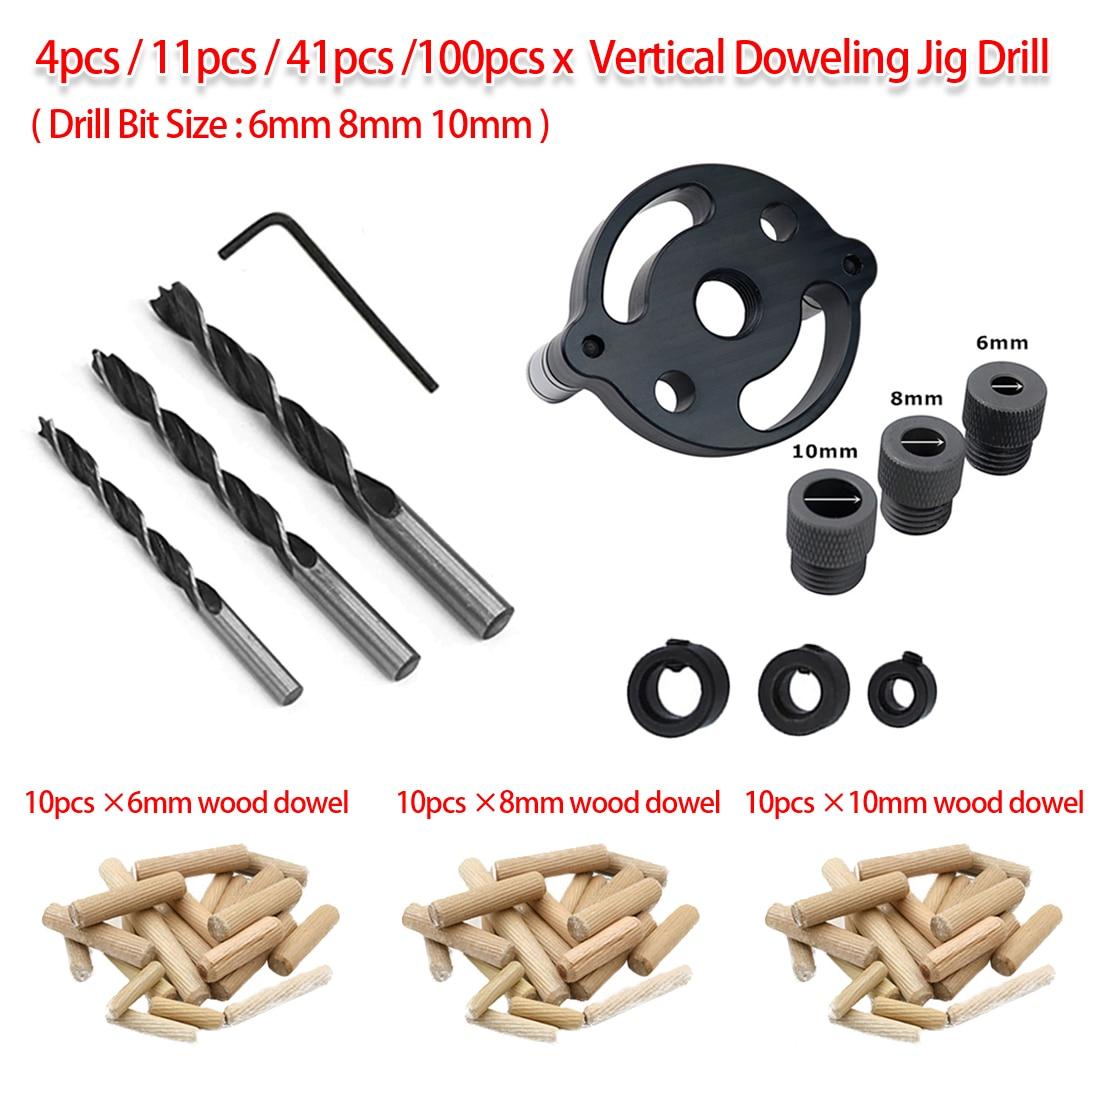 Woodworking Pocket Hole Jig 4pcs/11pcs/41pcs/100pcs 6mm 8mm 10mm Vertical Doweling Jig Drill Guide For Locator Hole Puncher